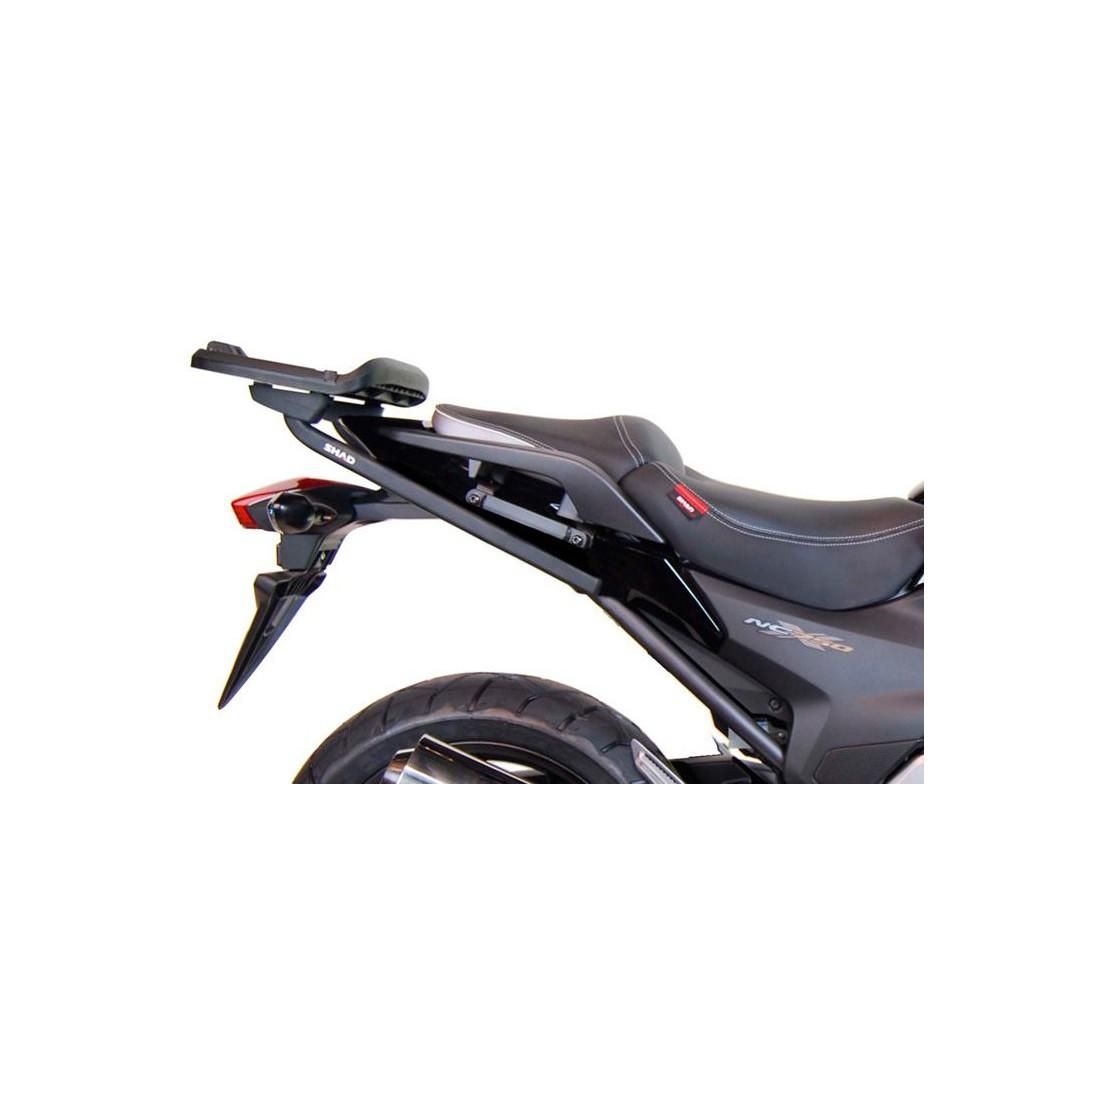 Fijación Side Master Shad Honda INTEGRA 700 12-13 INTEGRA 750 14-15 NC700 X/S 12-13 NC750 X/S 14-15